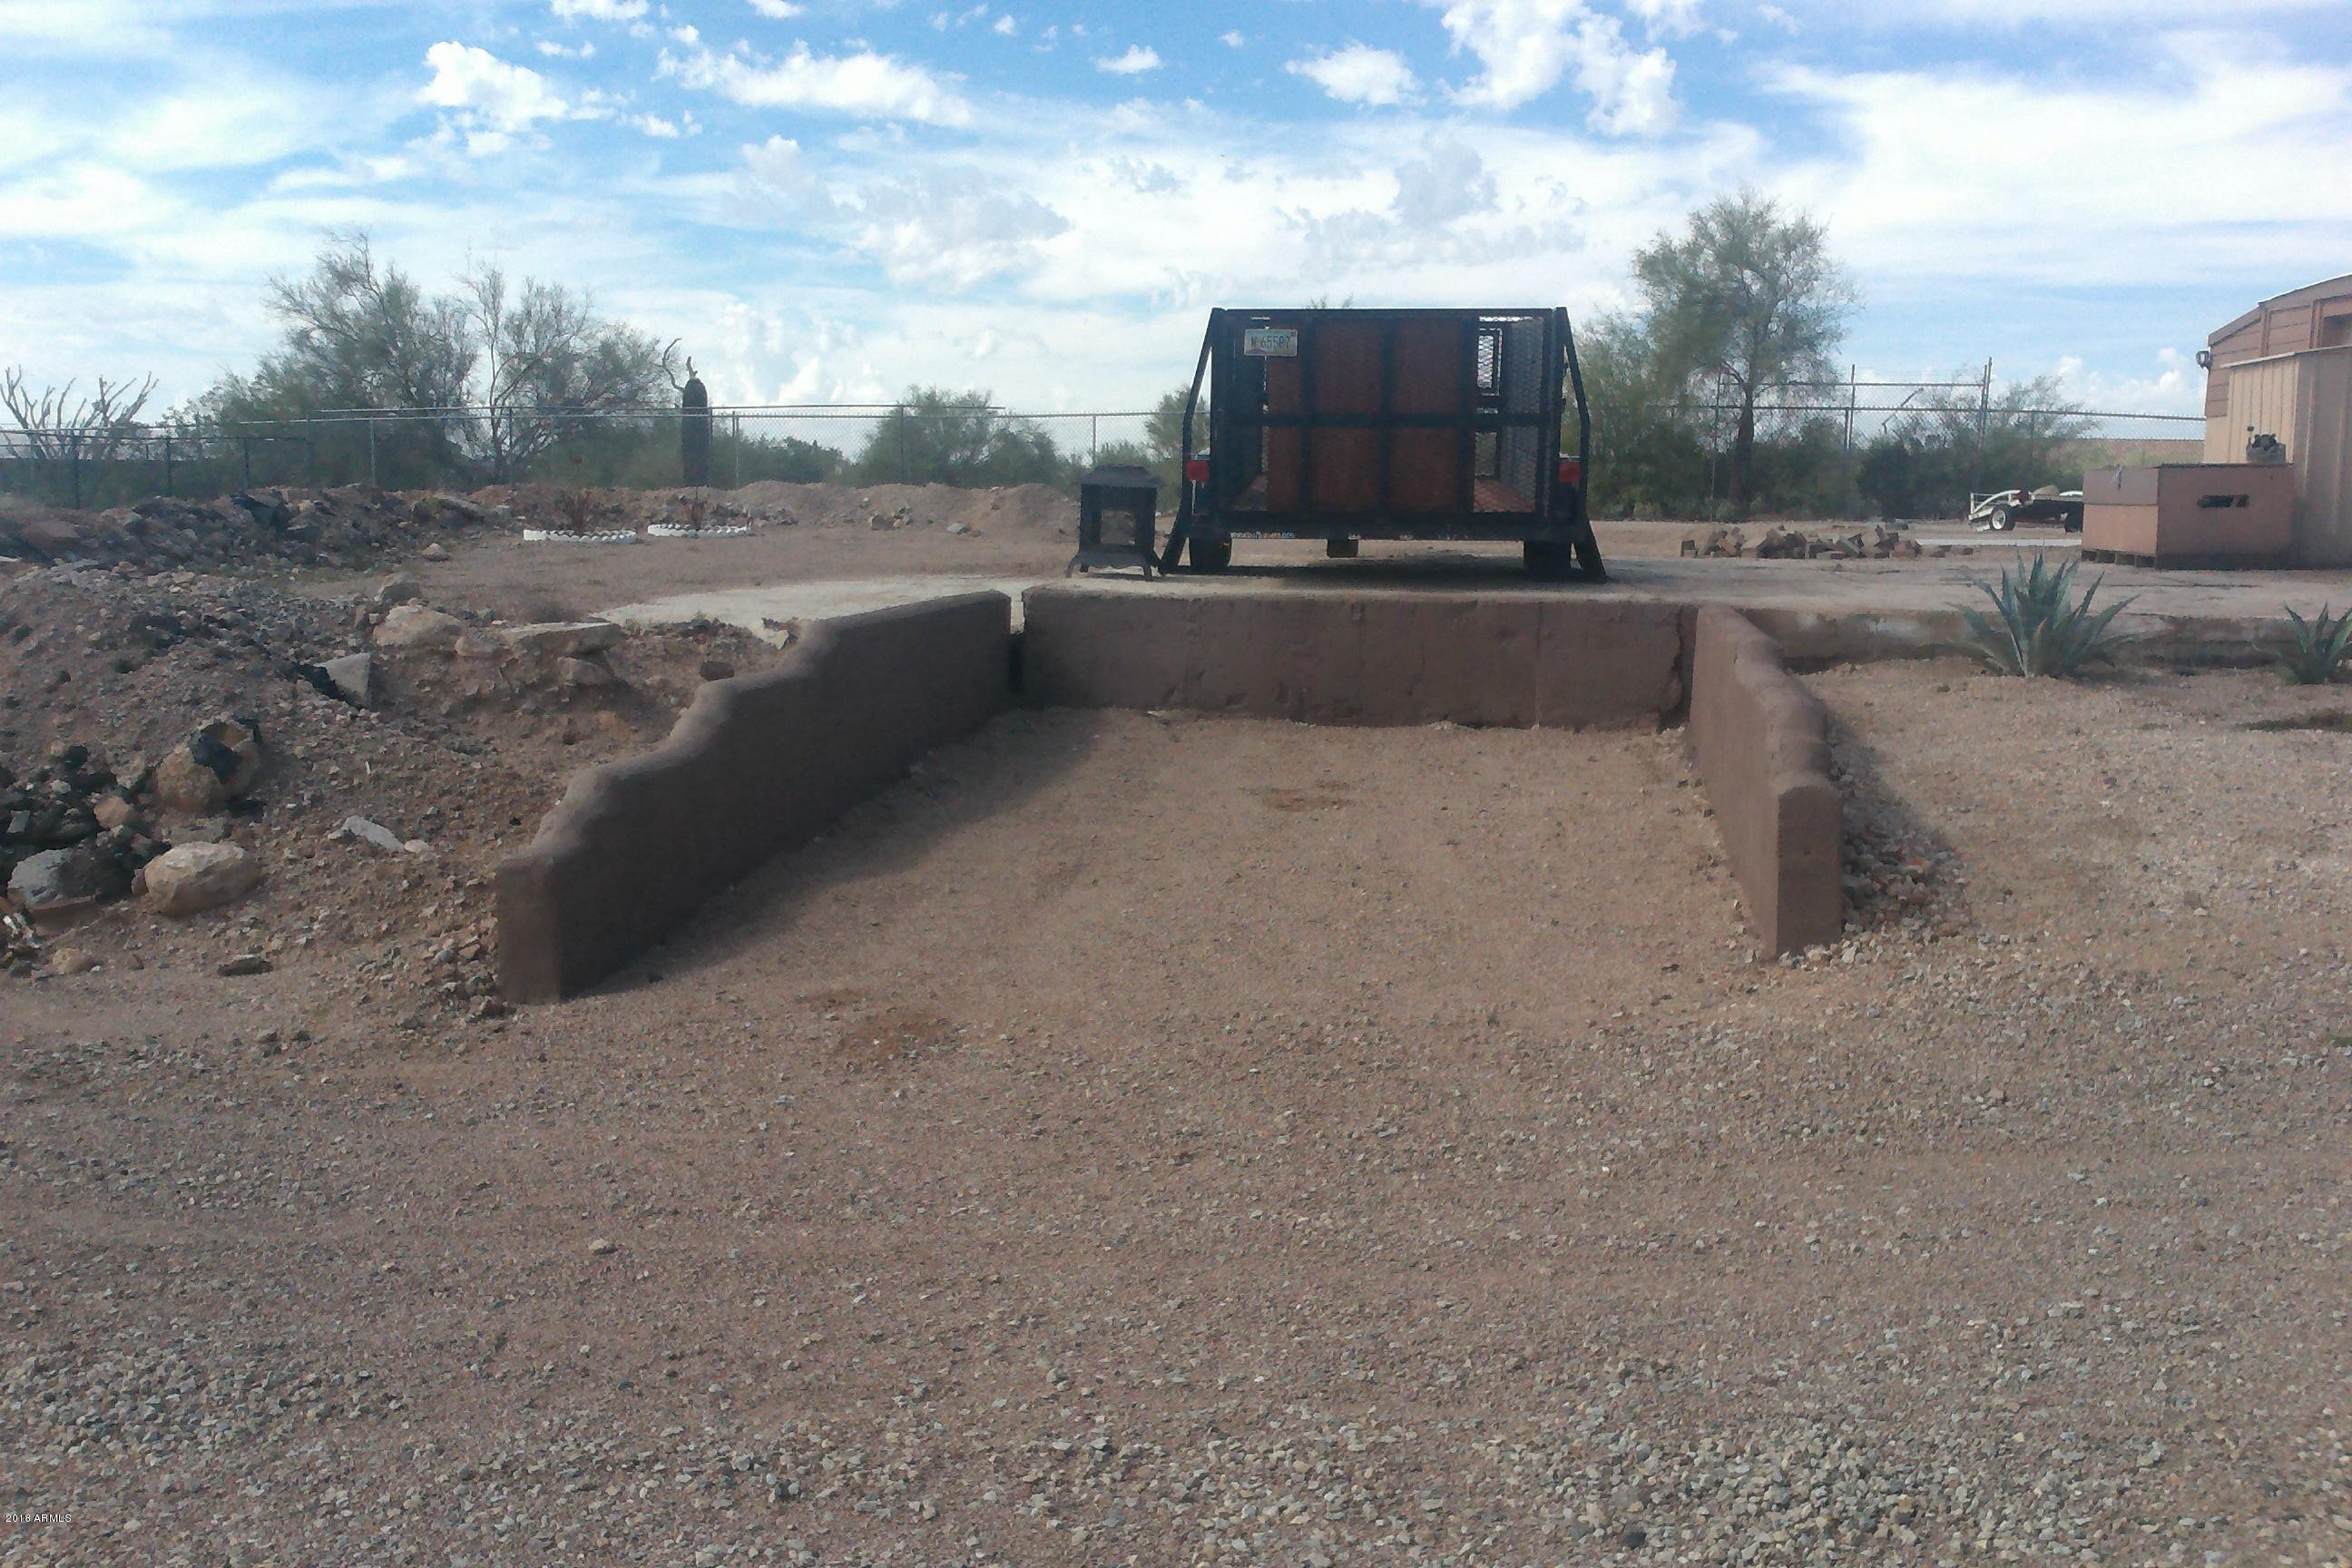 MLS 5834167 318 S GOLDFIELD Road, Apache Junction, AZ 85119 Apache Junction AZ Newly Built